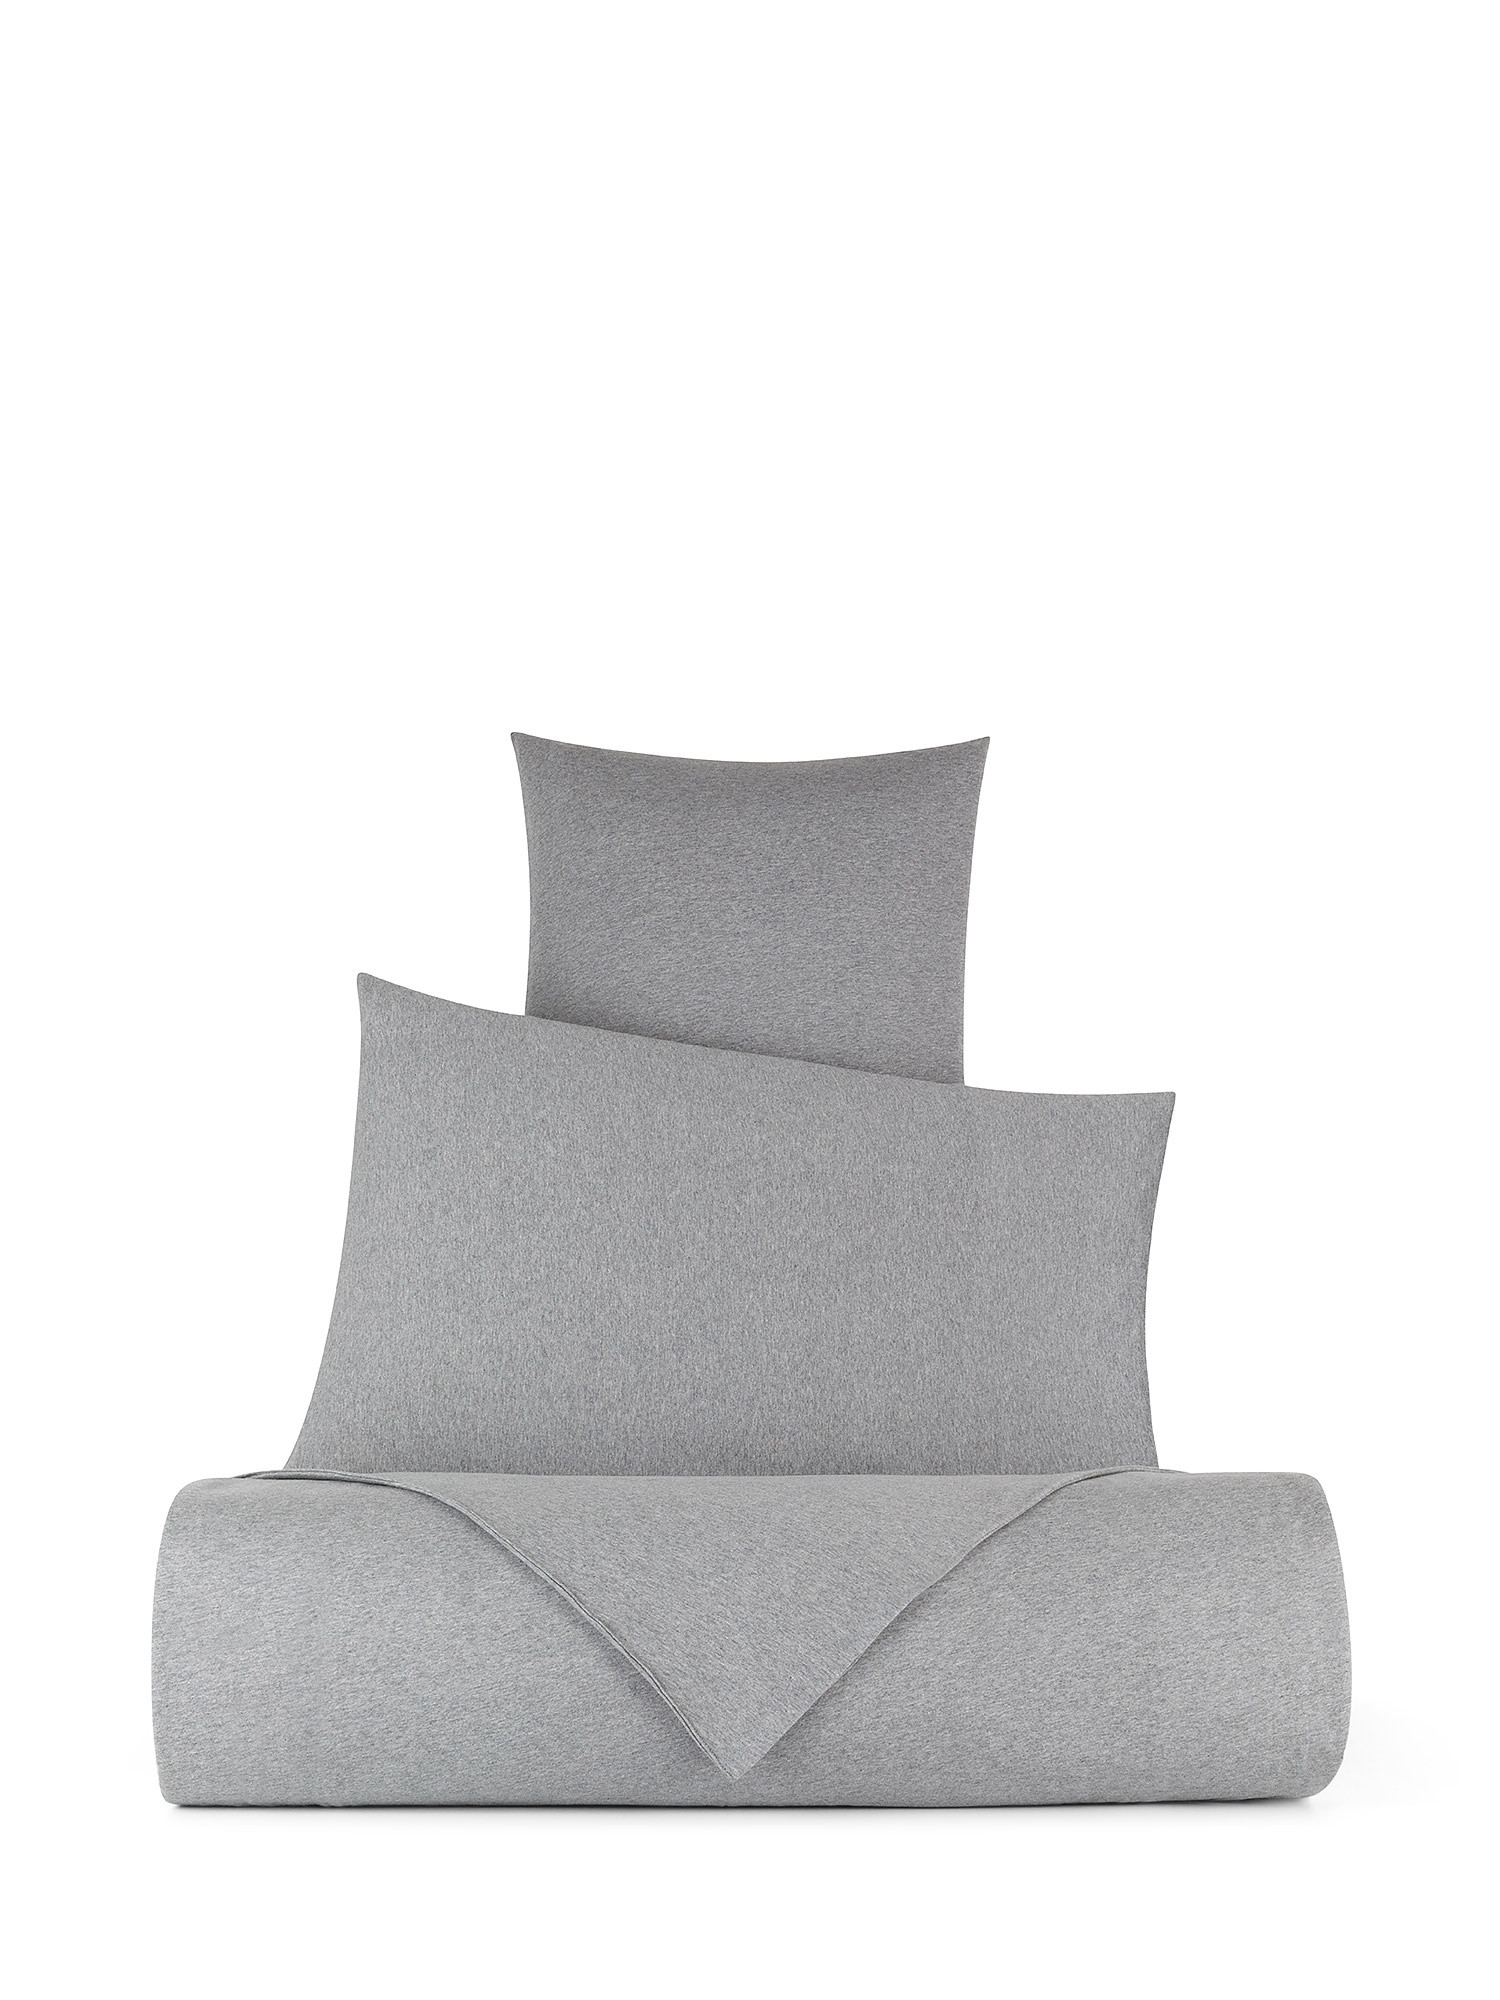 Parure copripiumino jersey di cotone tinta unita, Grigio, large image number 0